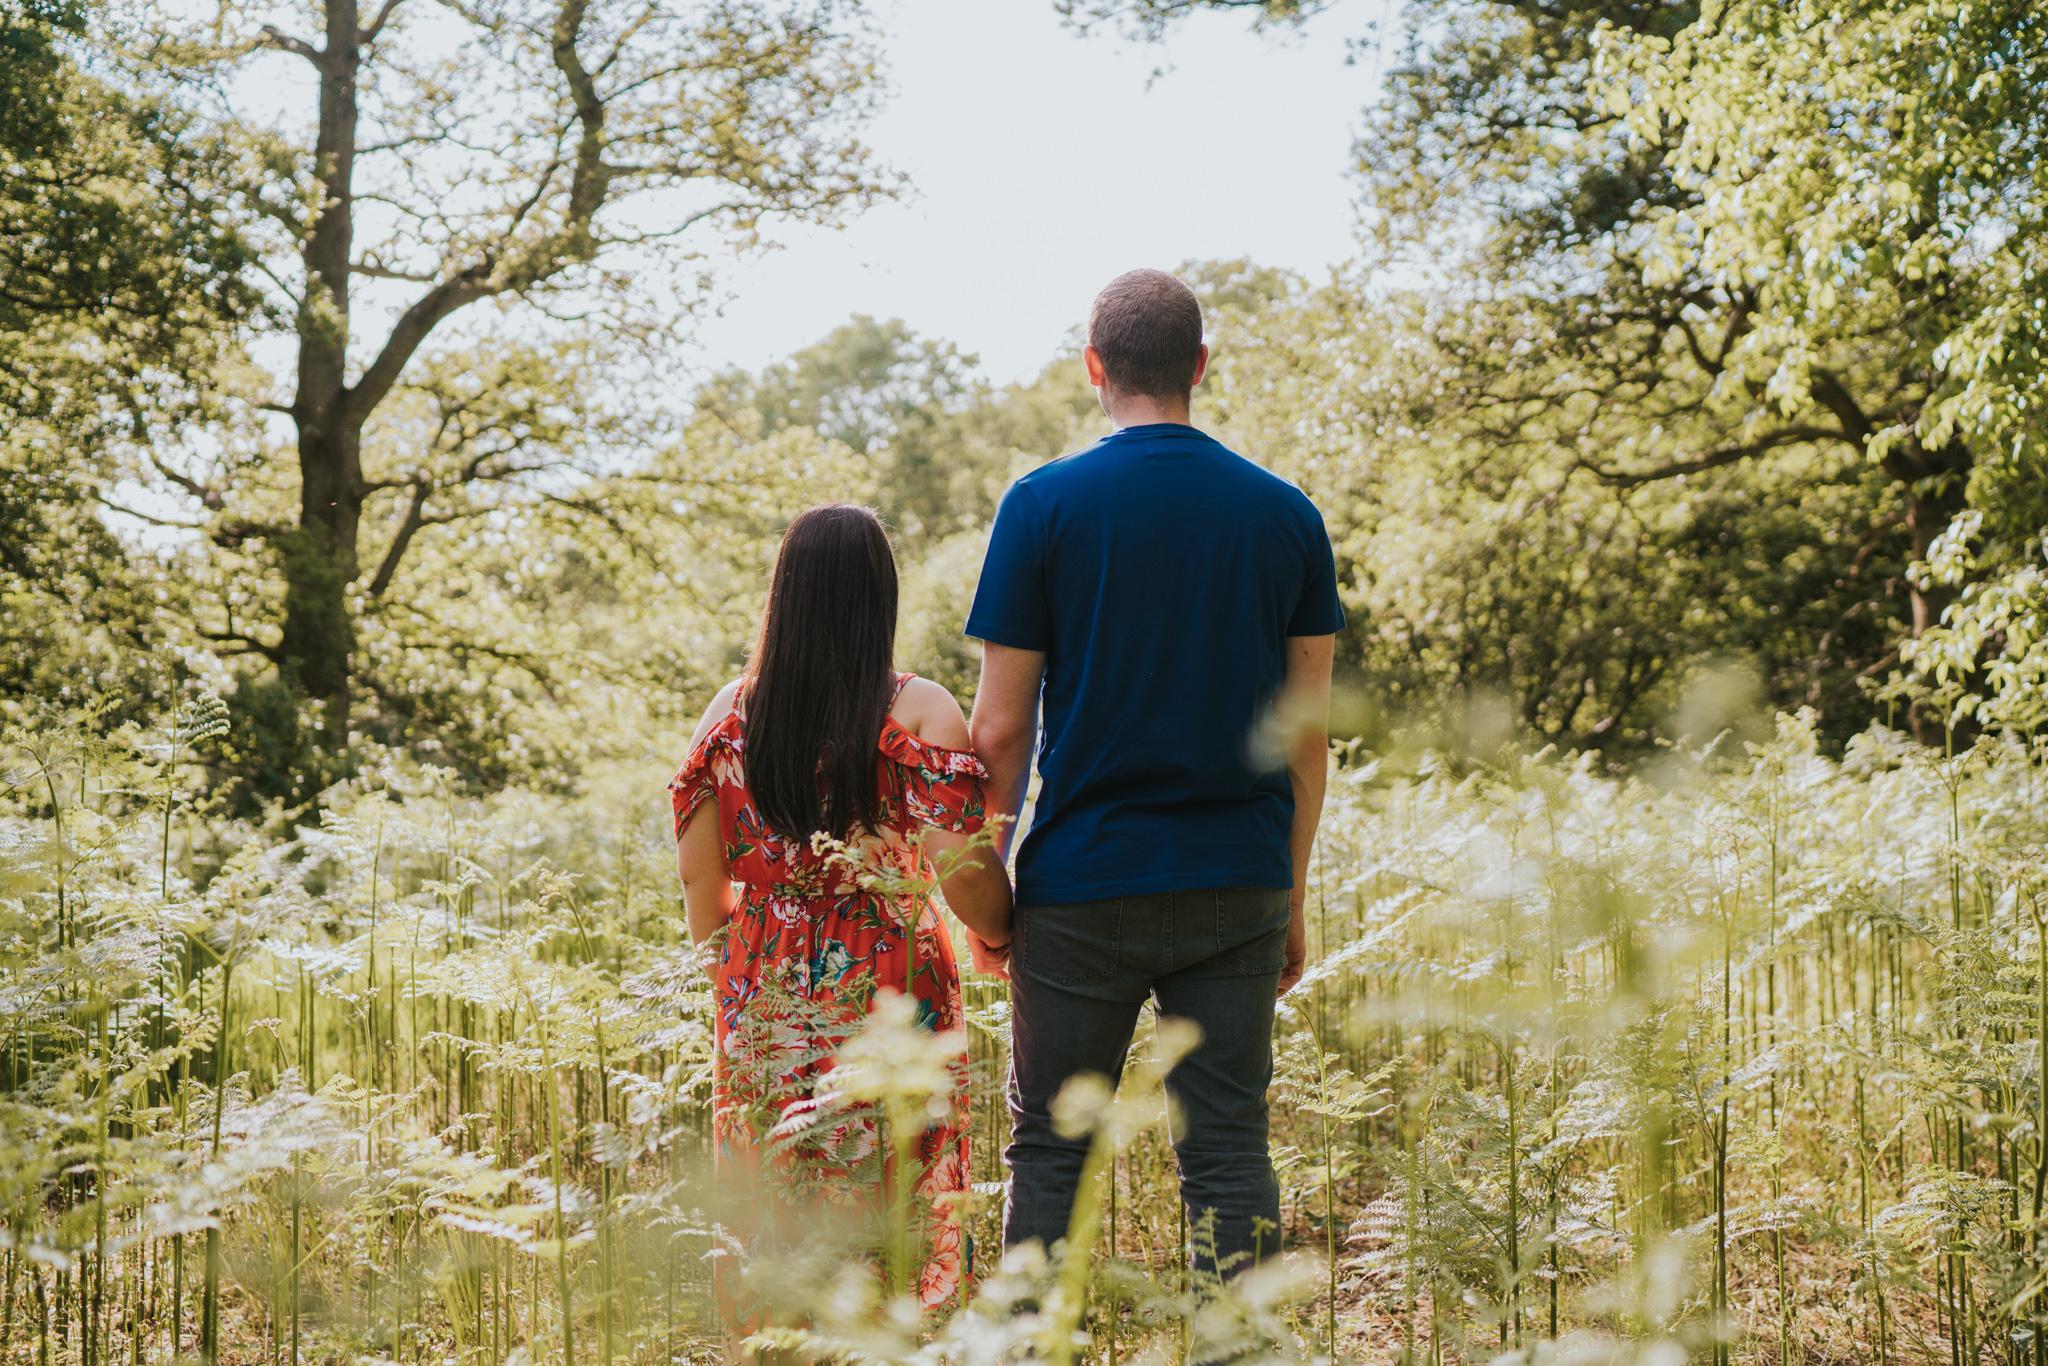 emily-dom-pre-wedding-session-west-bergholt-colchester-grace-elizabeth-colchester-essex-alternative-wedding-lifestyle-photographer-essex-suffolk-norfolk-devon (9 of 34).jpg